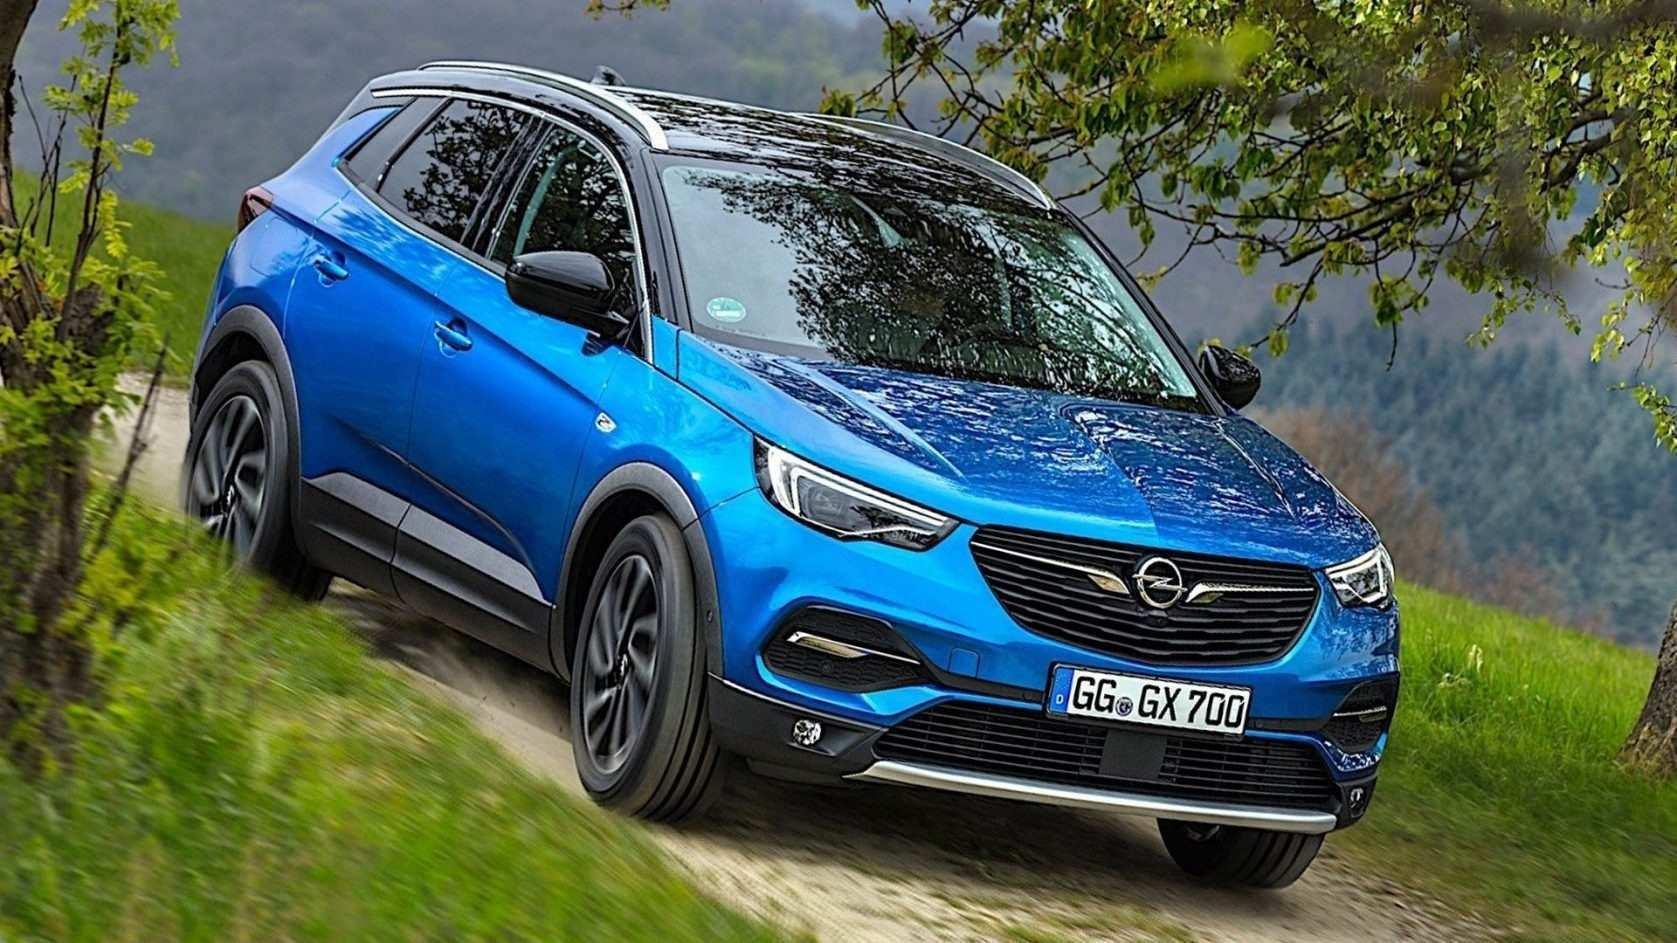 39 Concept of Opel Antara 2019 Interior by Opel Antara 2019